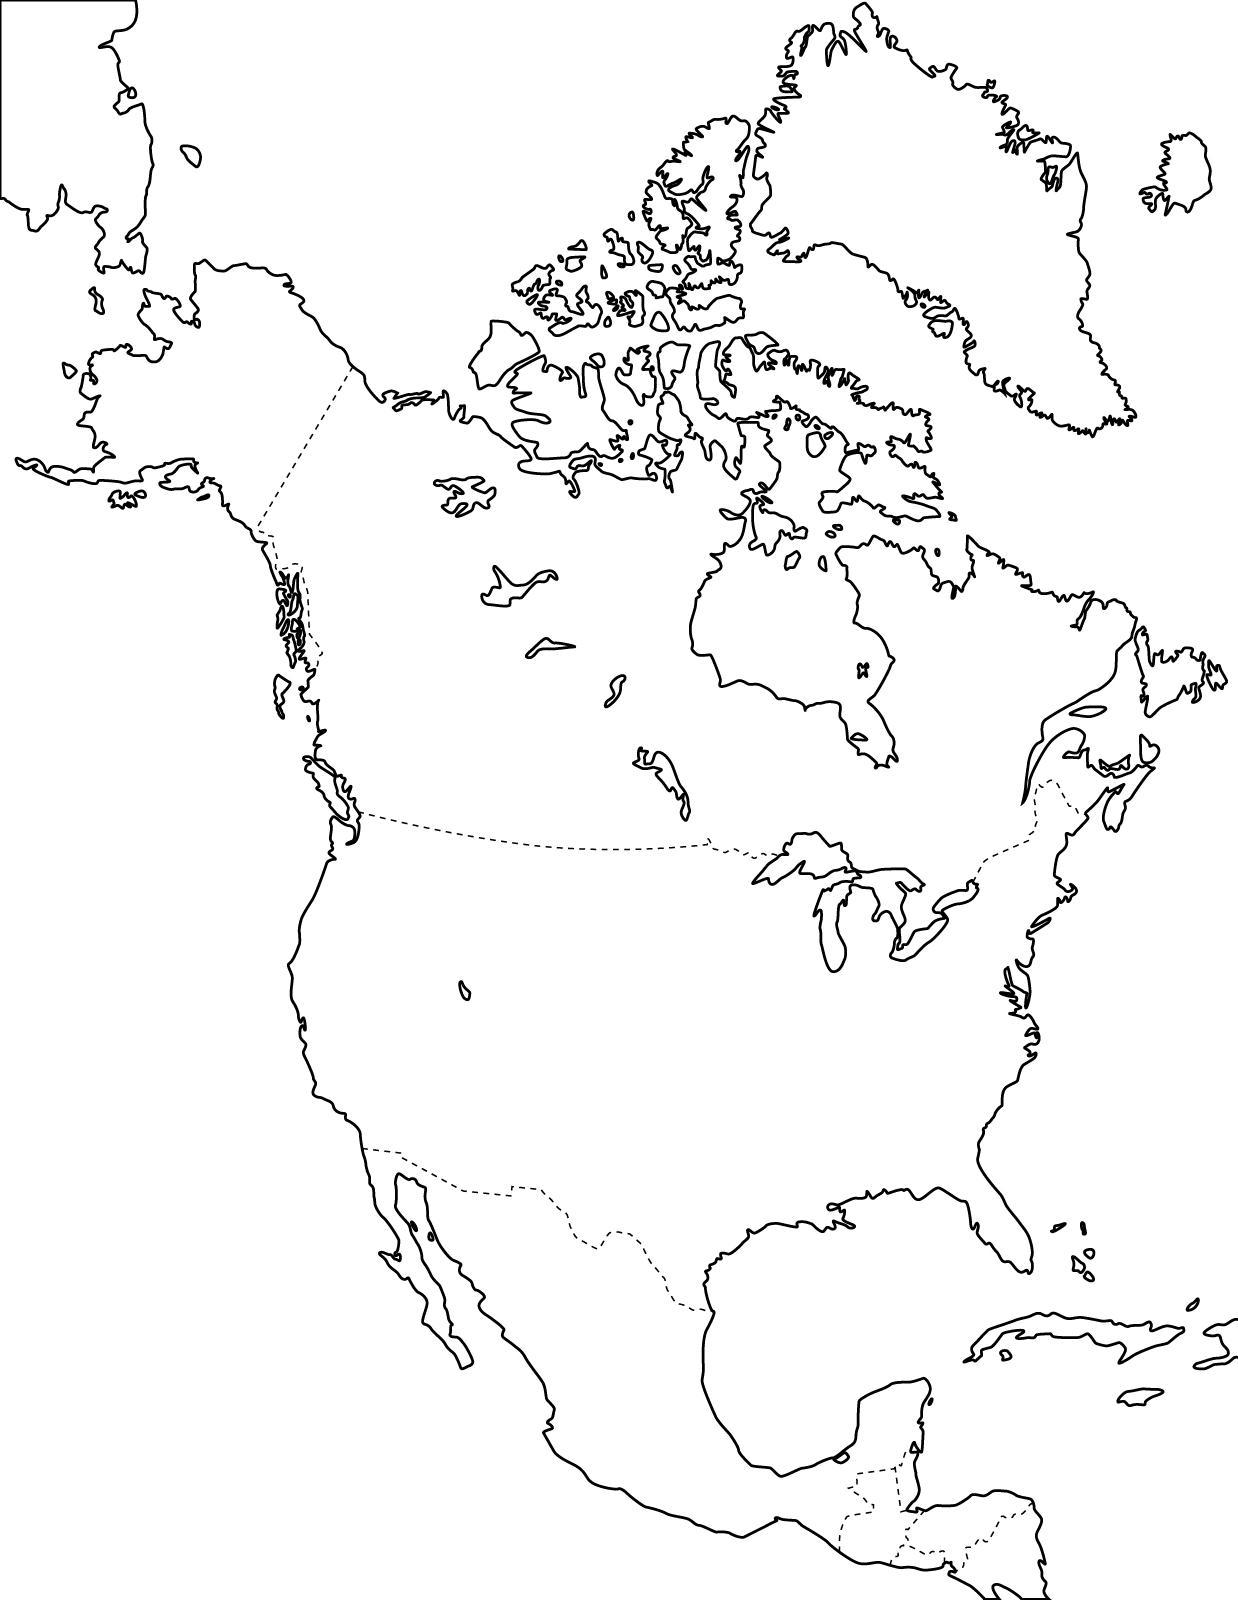 Mapa político mudo de América del Norte para imprimir Mapa